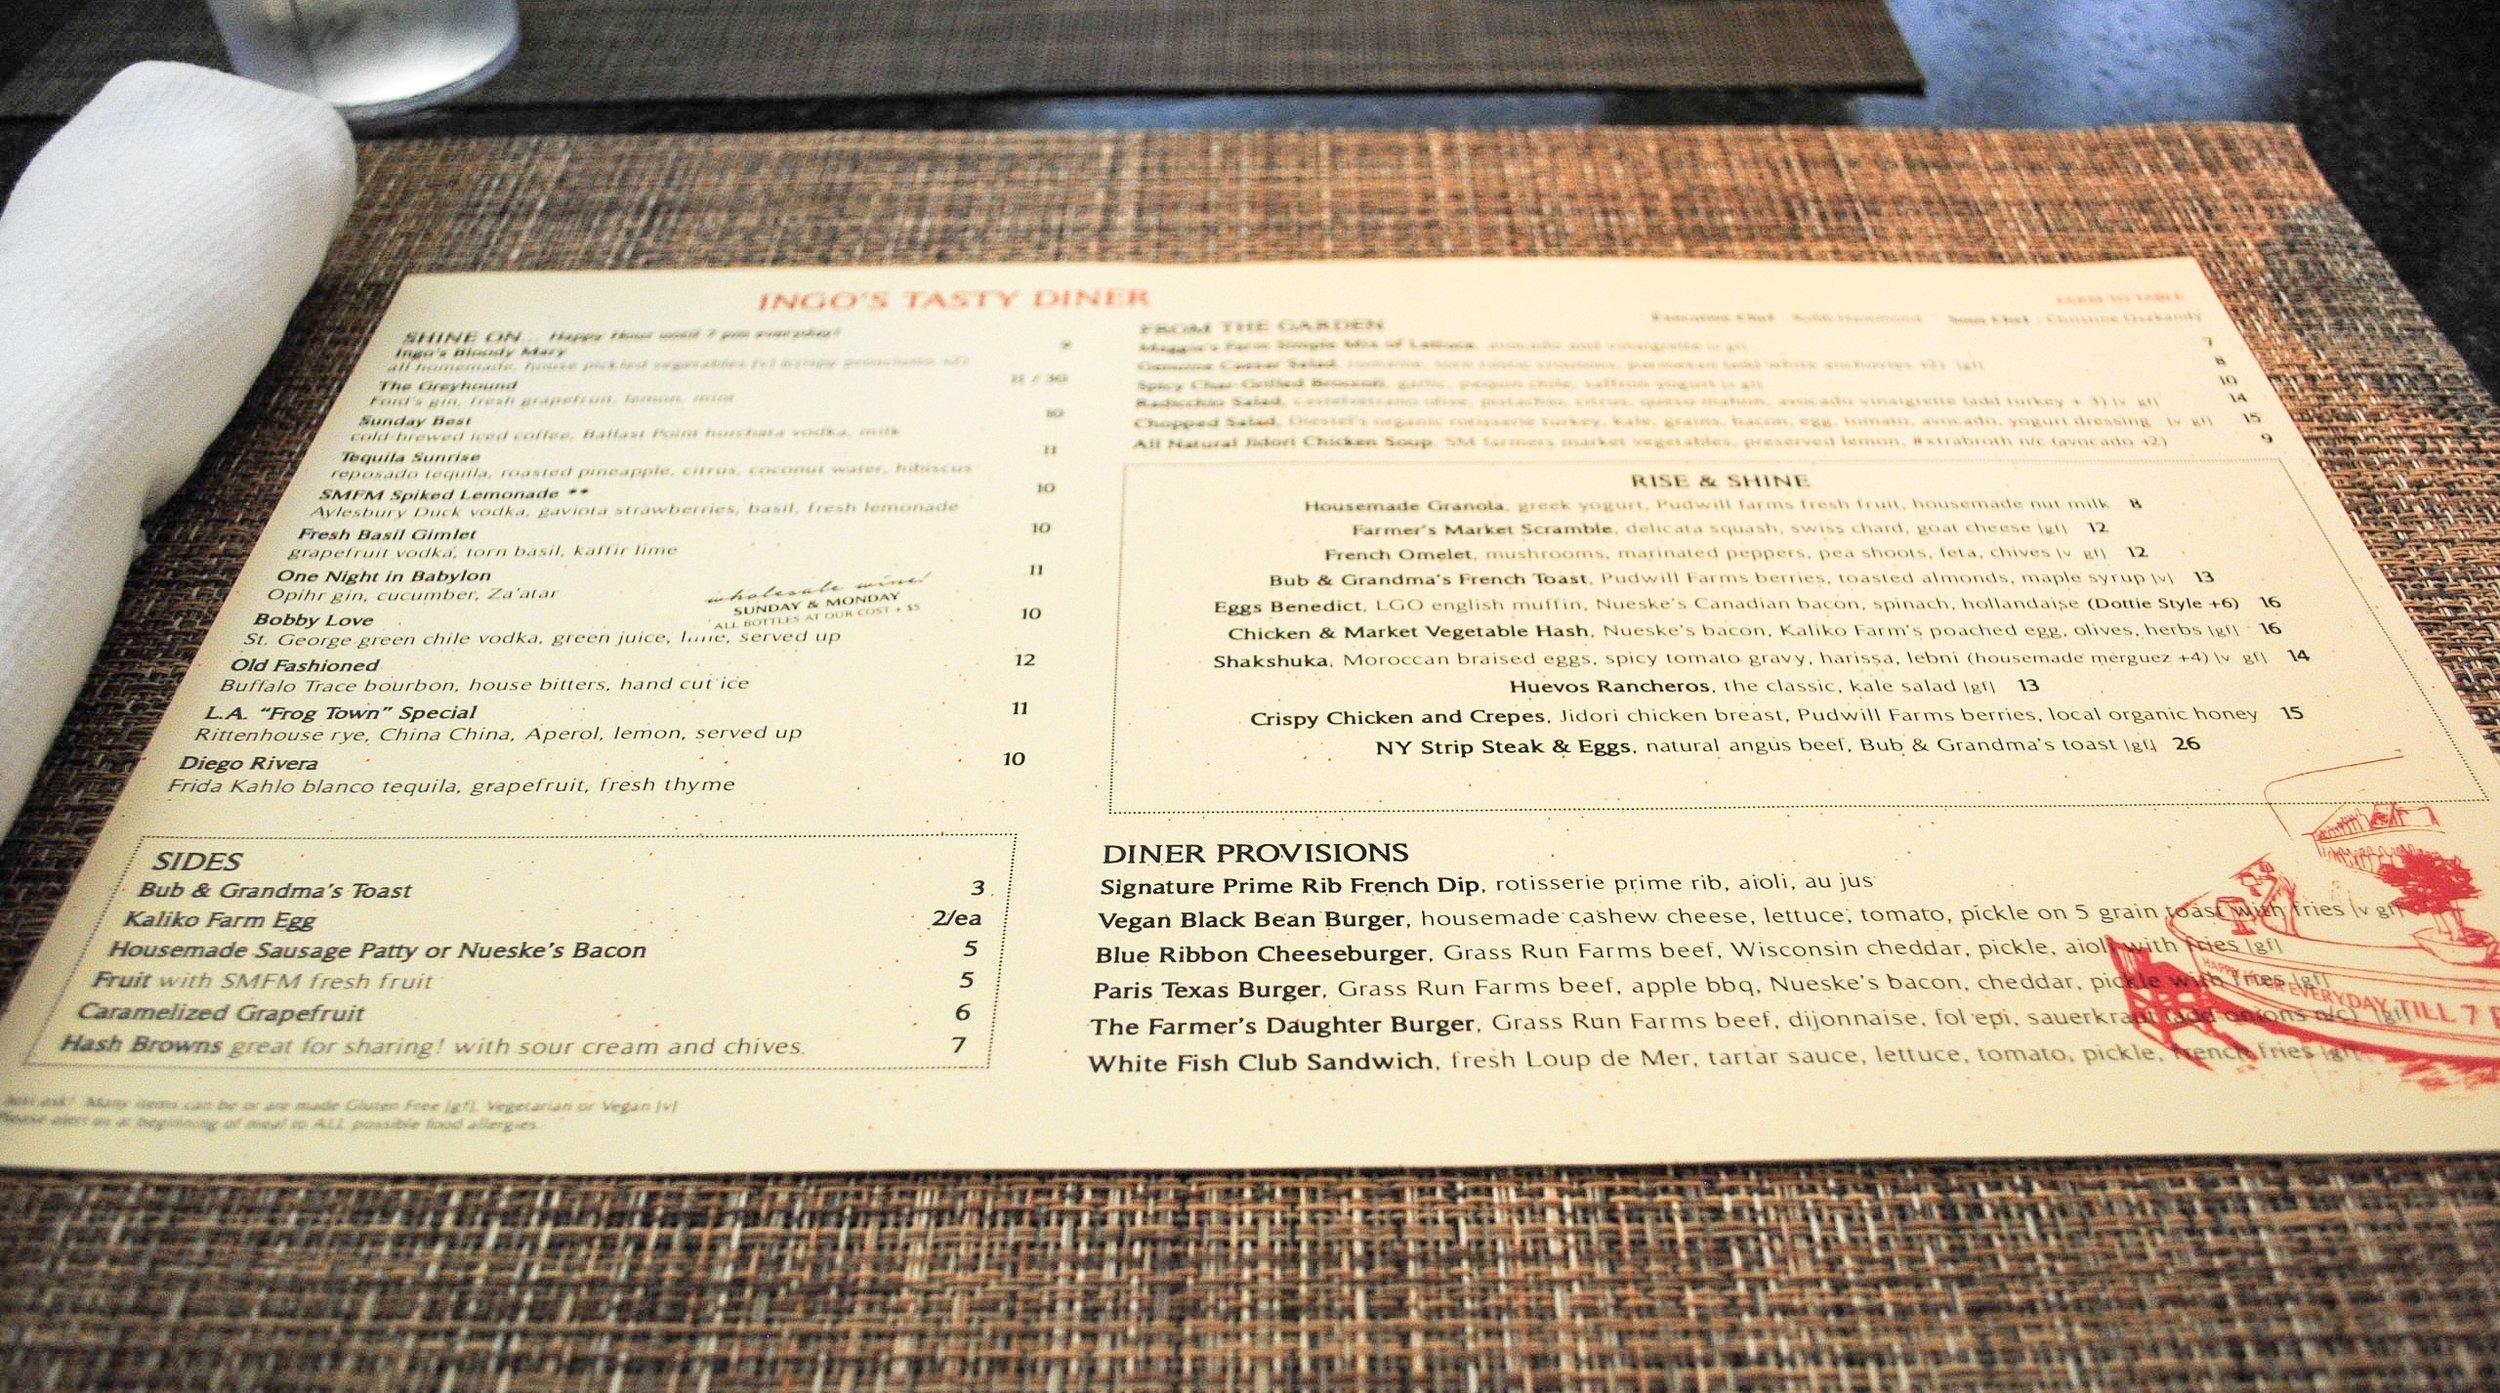 Menu at Ingo's Tasty Diner, Santa Monica, CA